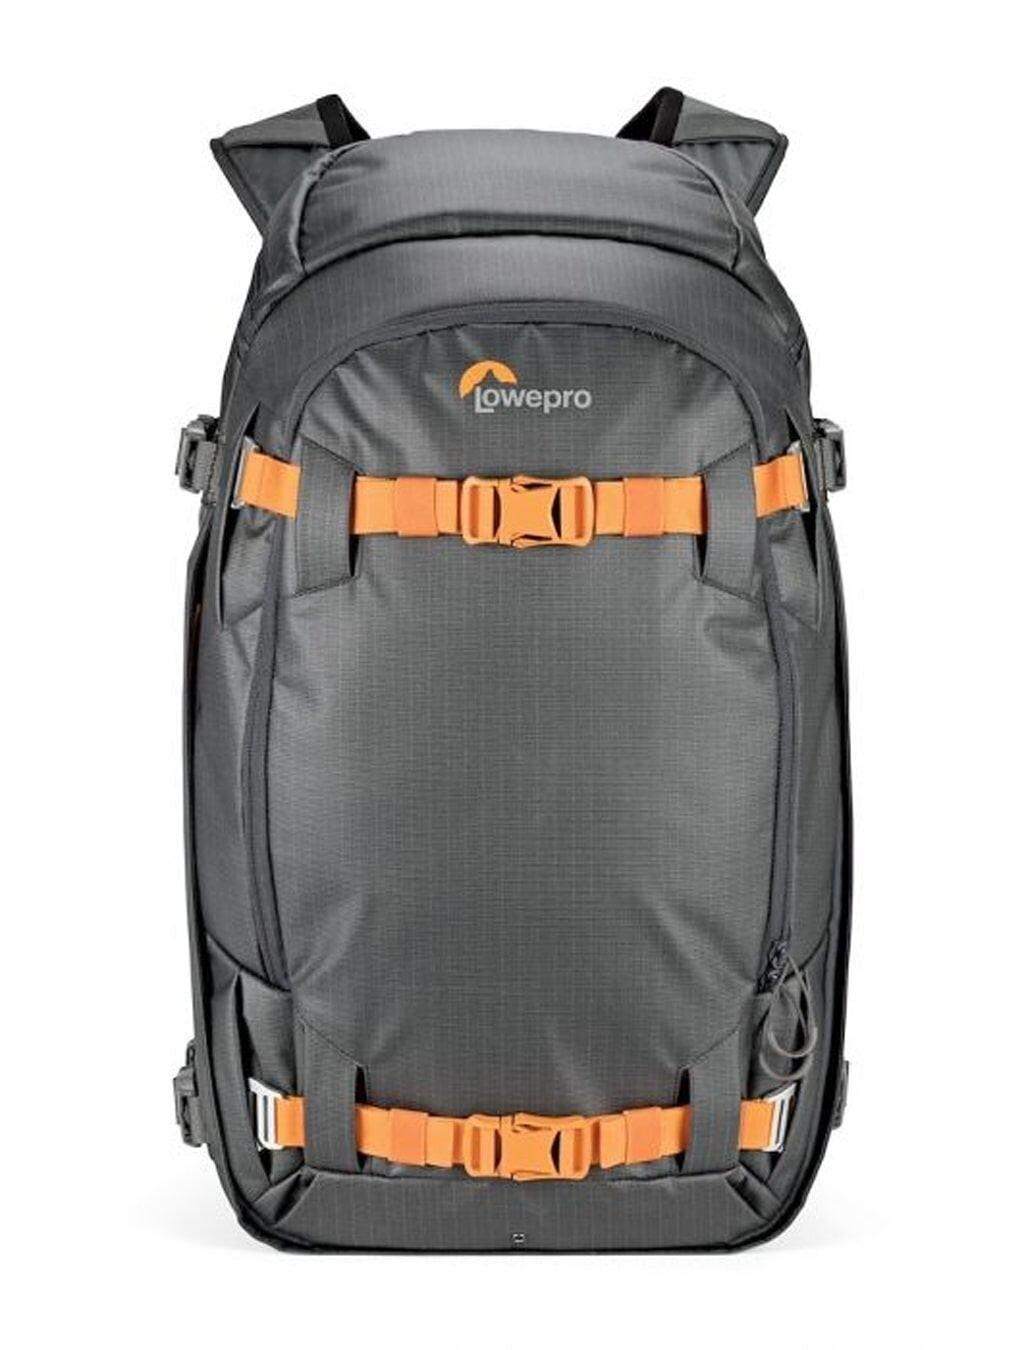 Lowepro Whistler BP 450 AW II grau/orange